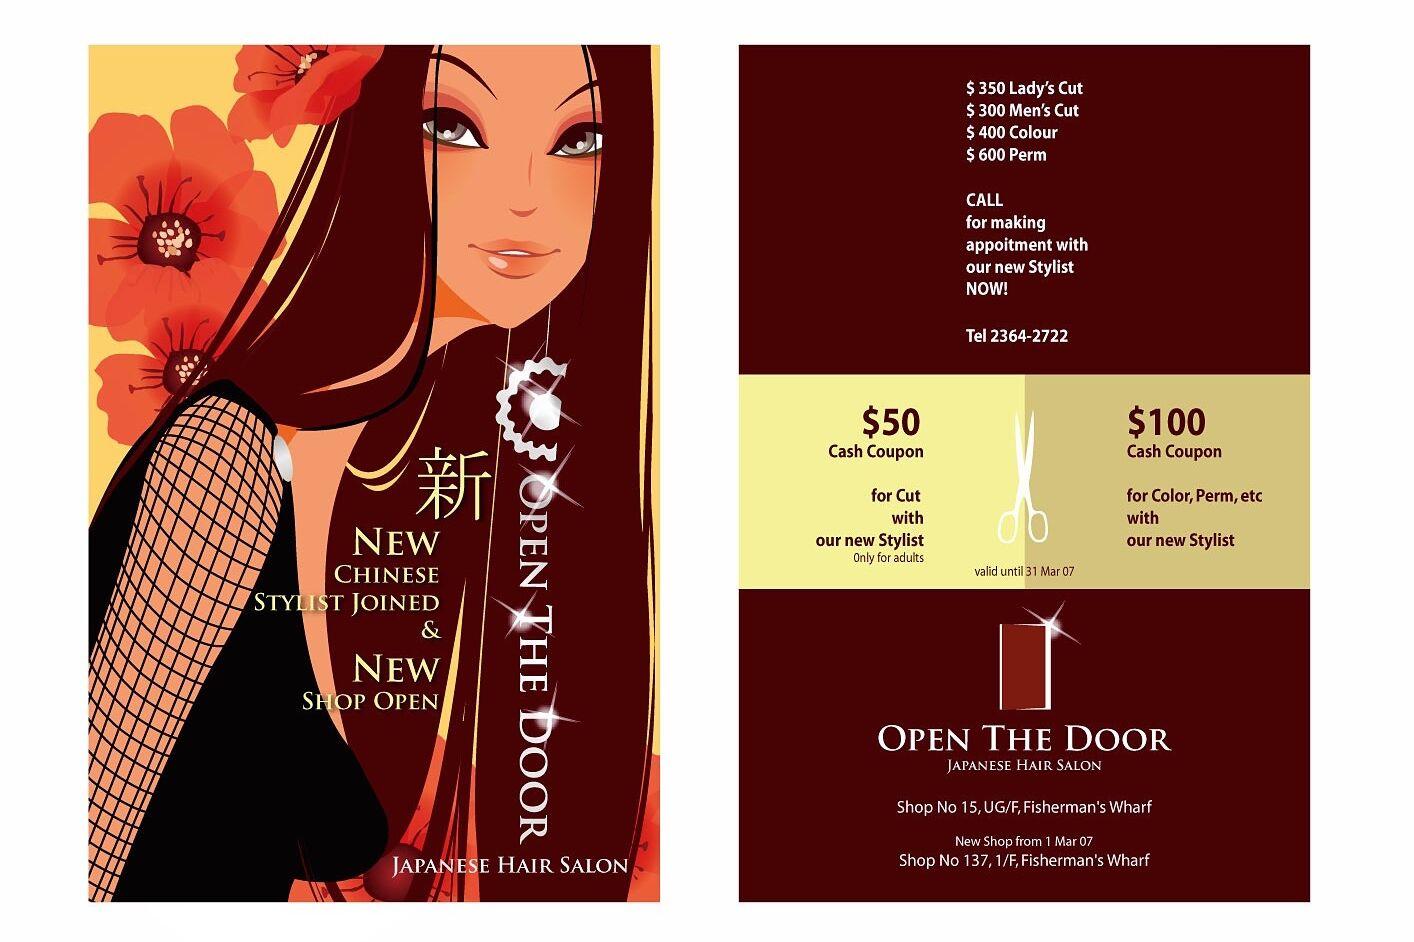 Open The Door Hair Salon 07